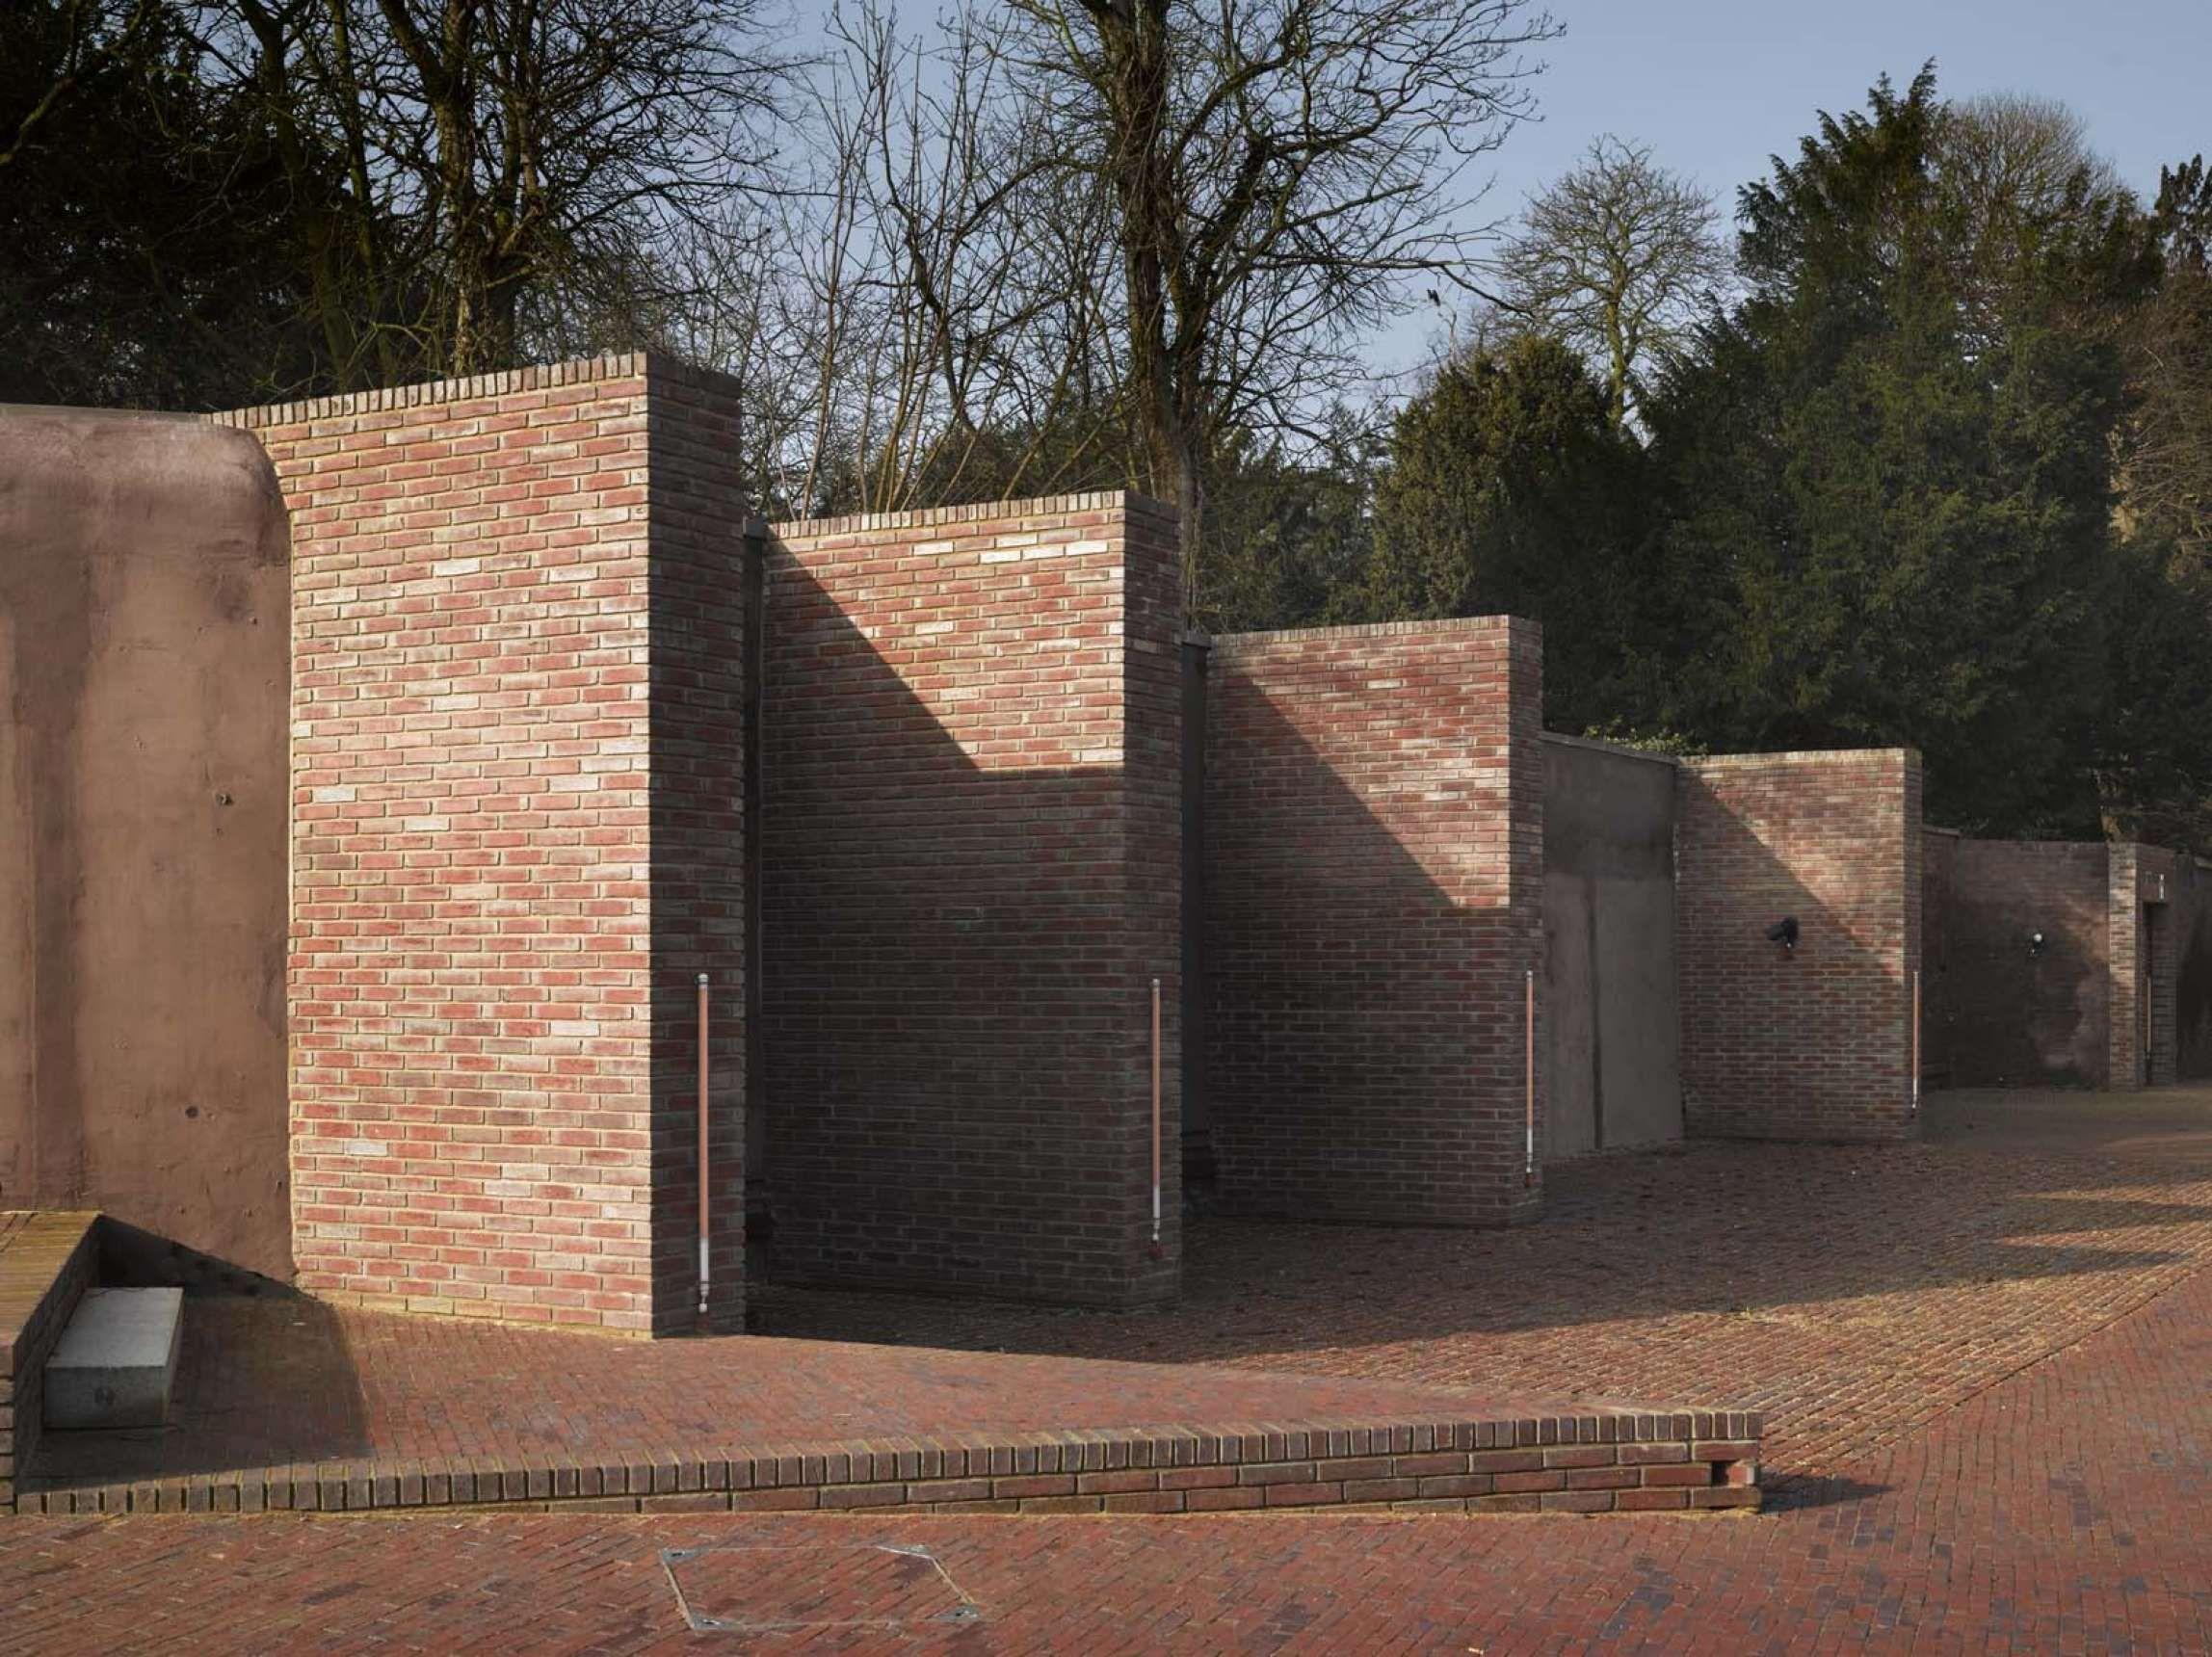 Pin By Robert White On Precedents Education Yard Garden Wall Brick